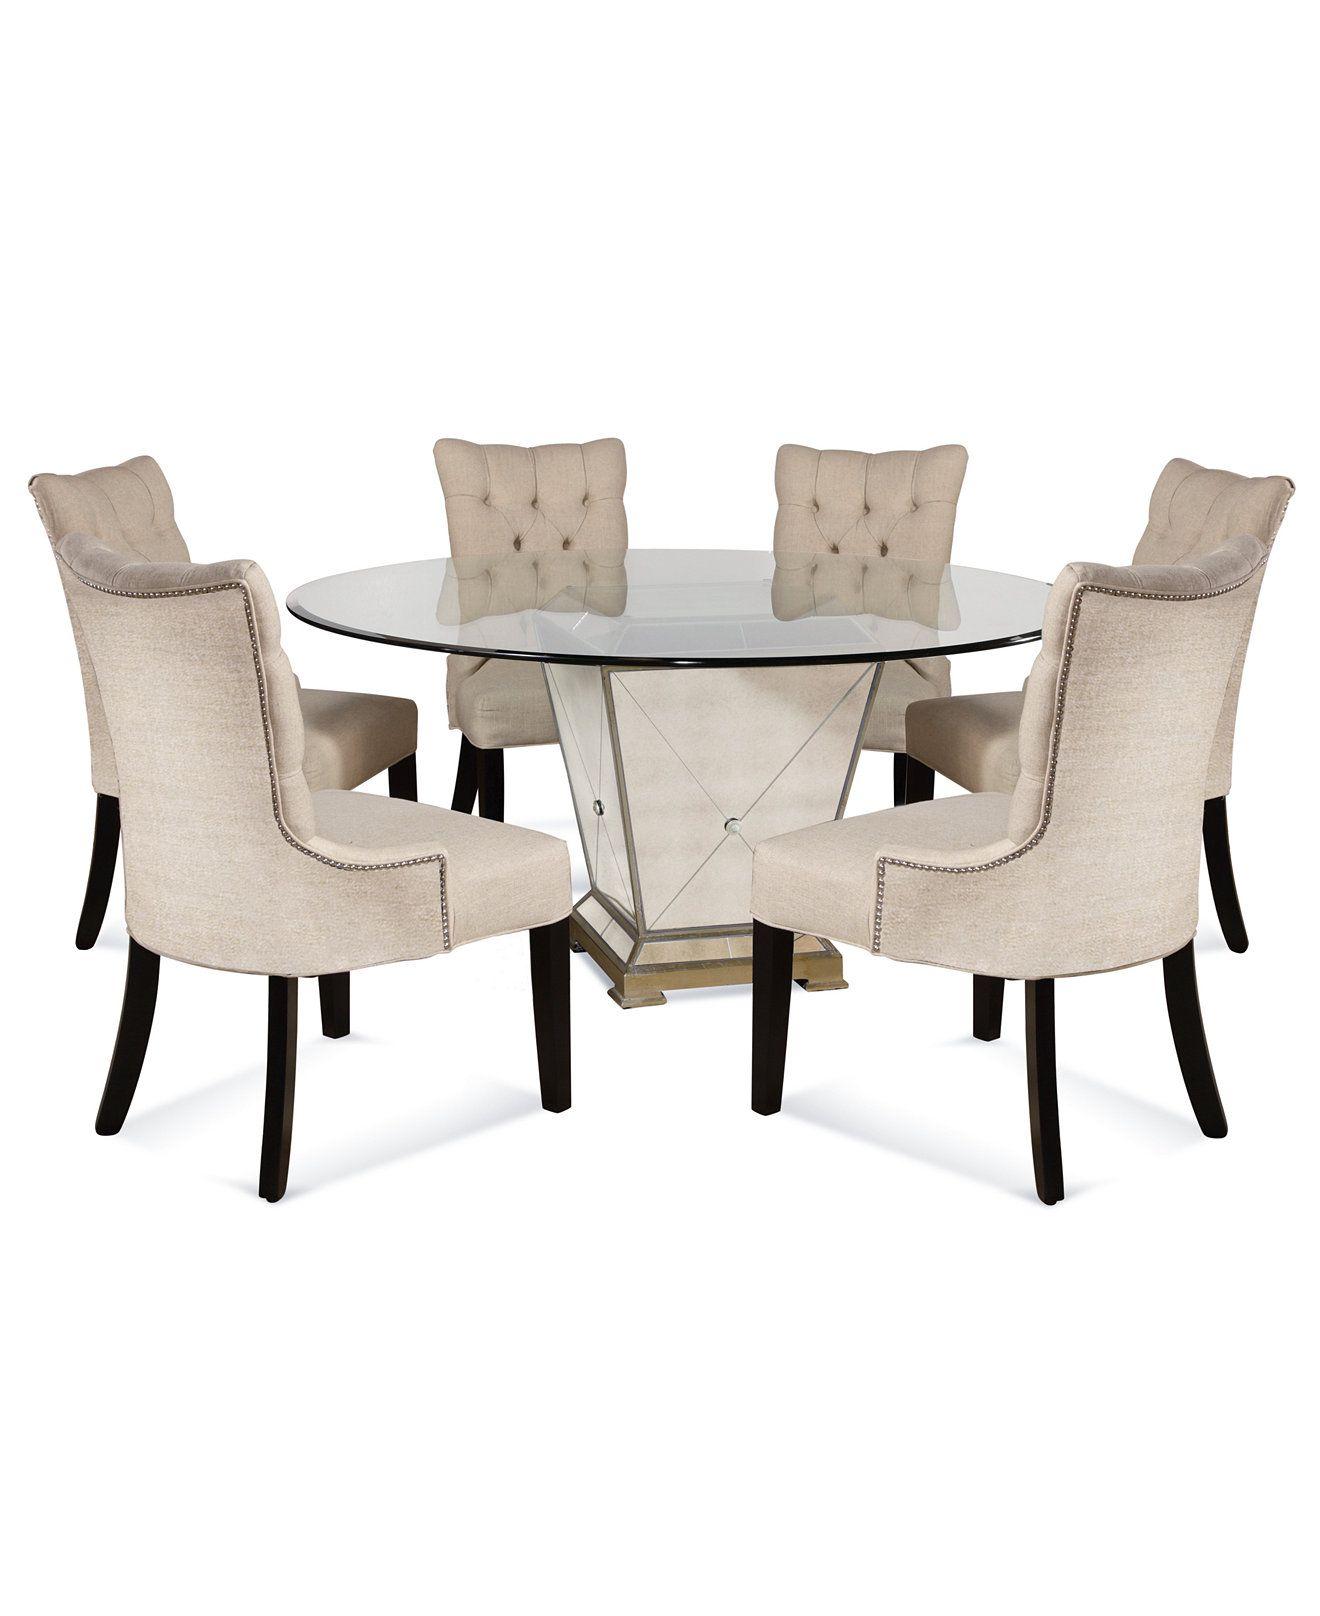 Marais Dining Room Furniture, 9 Piece Set 9